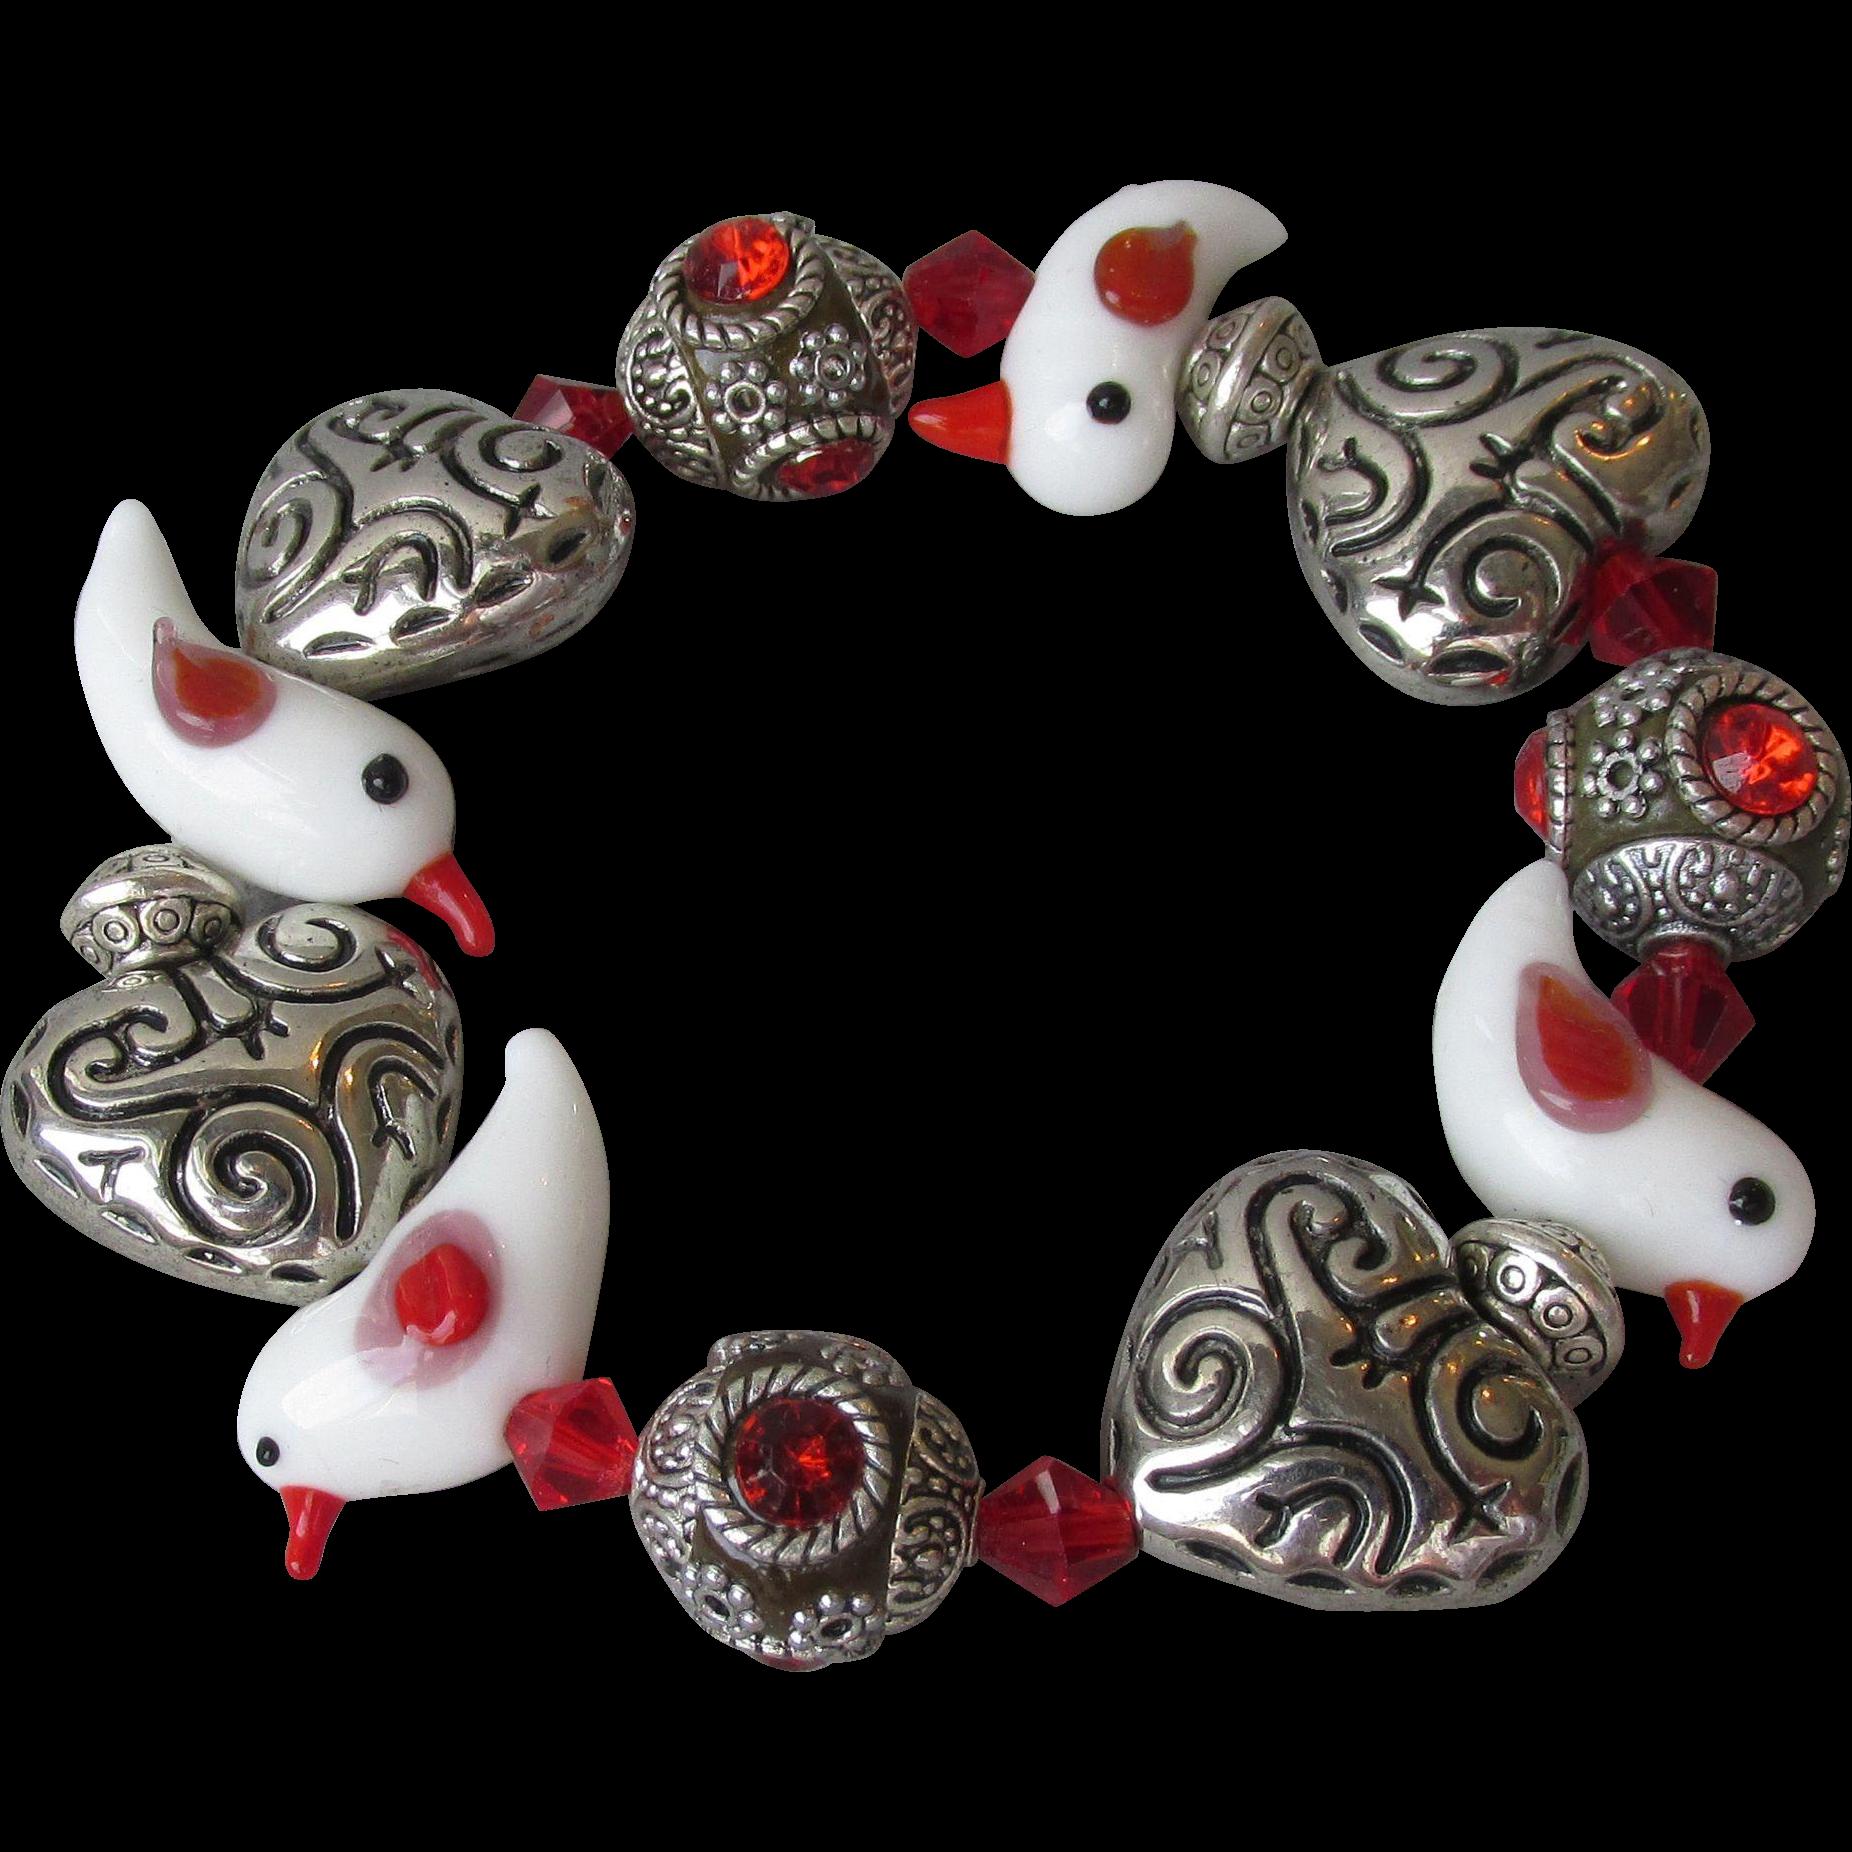 """My Secret Garden"" Lampwork Art Glass Bead Artisan Stretch Bracelet, ""Red Winged White Birds"" #B1"